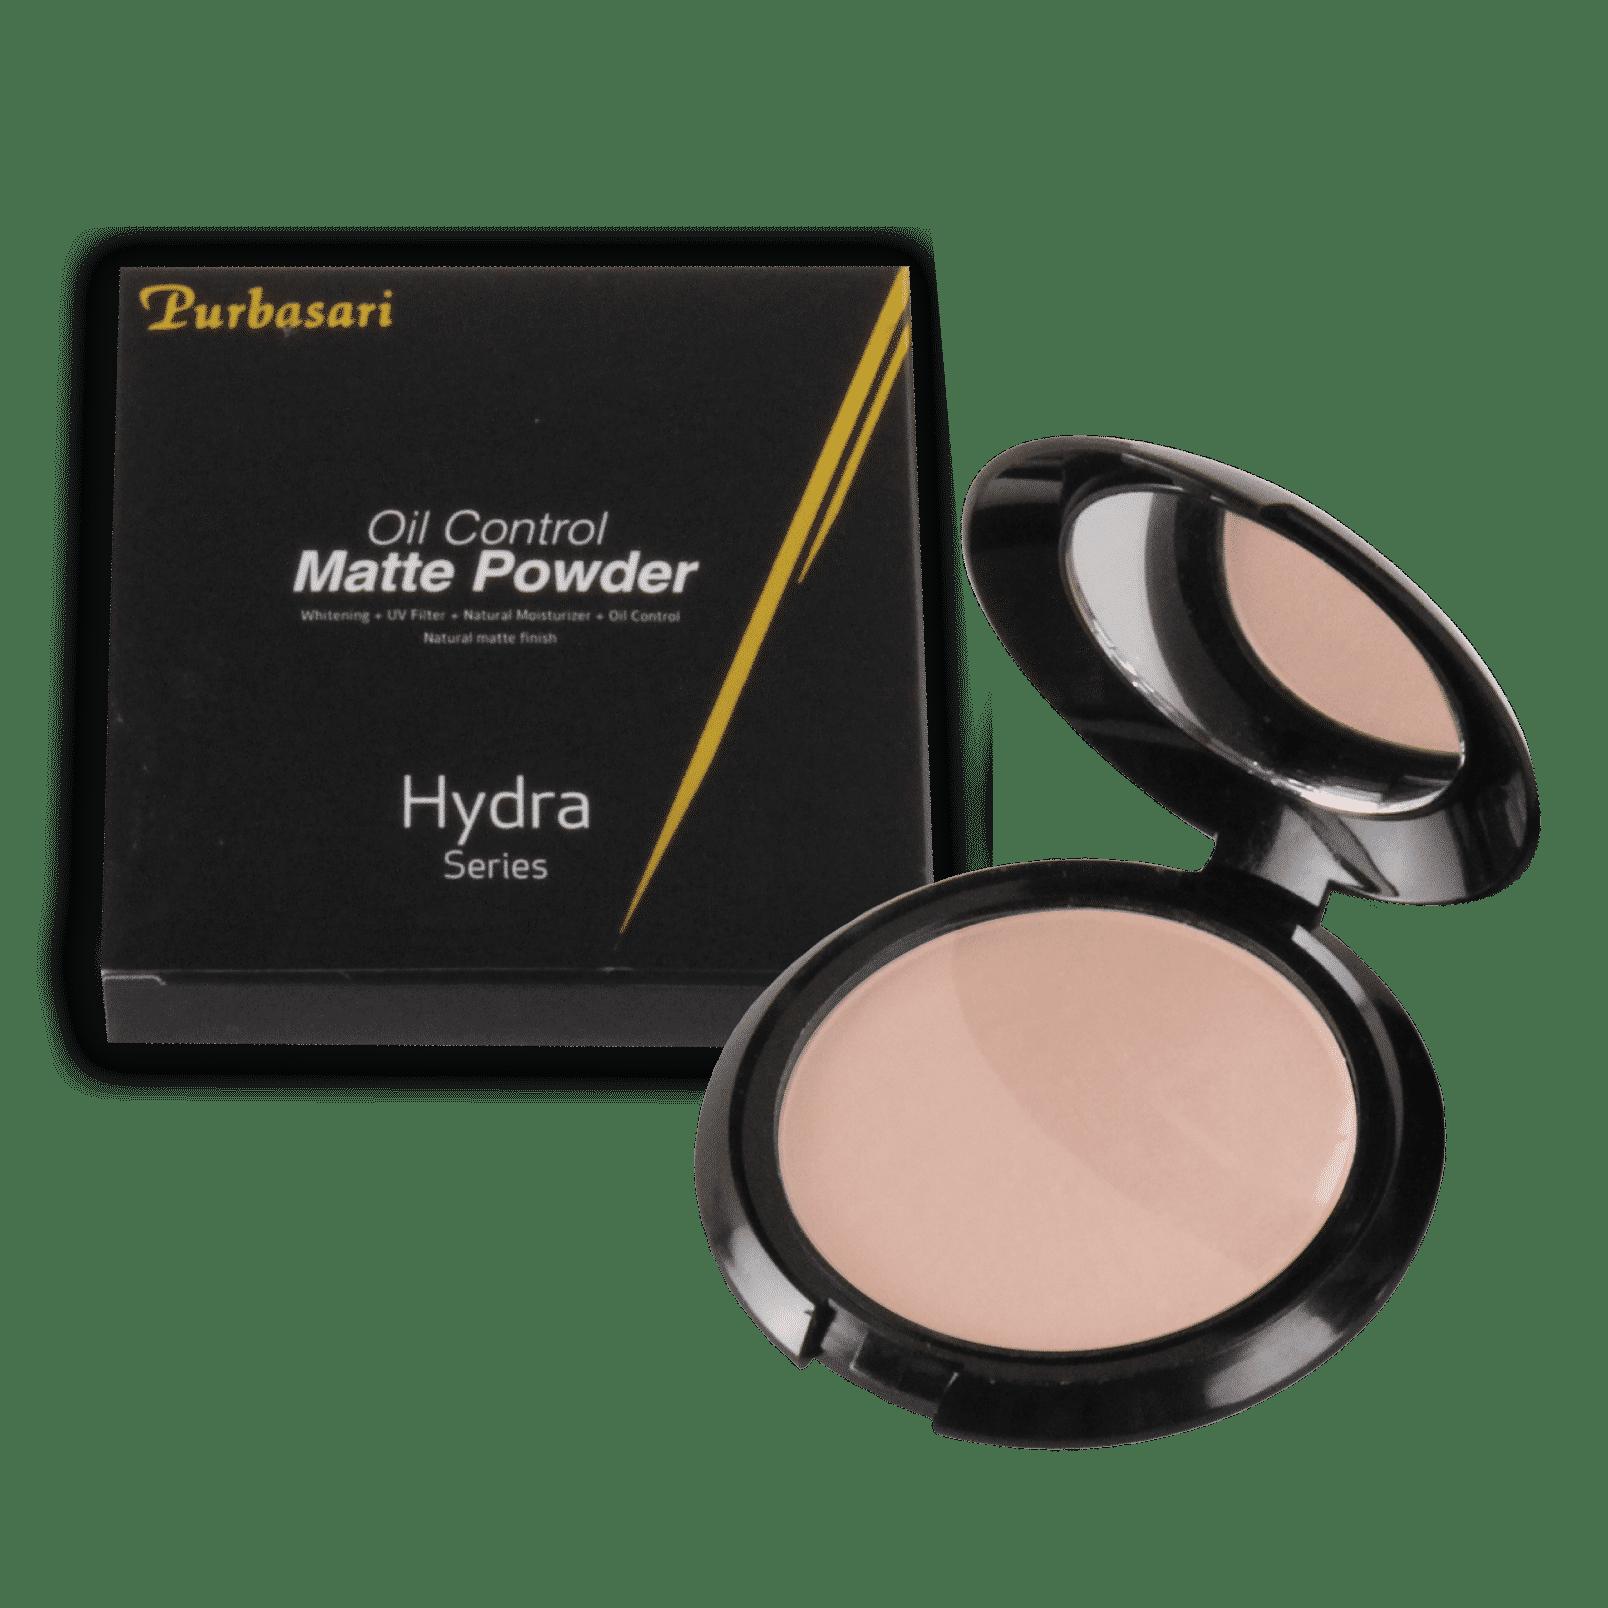 Purbasari-Oil-Control-Matte-Powder